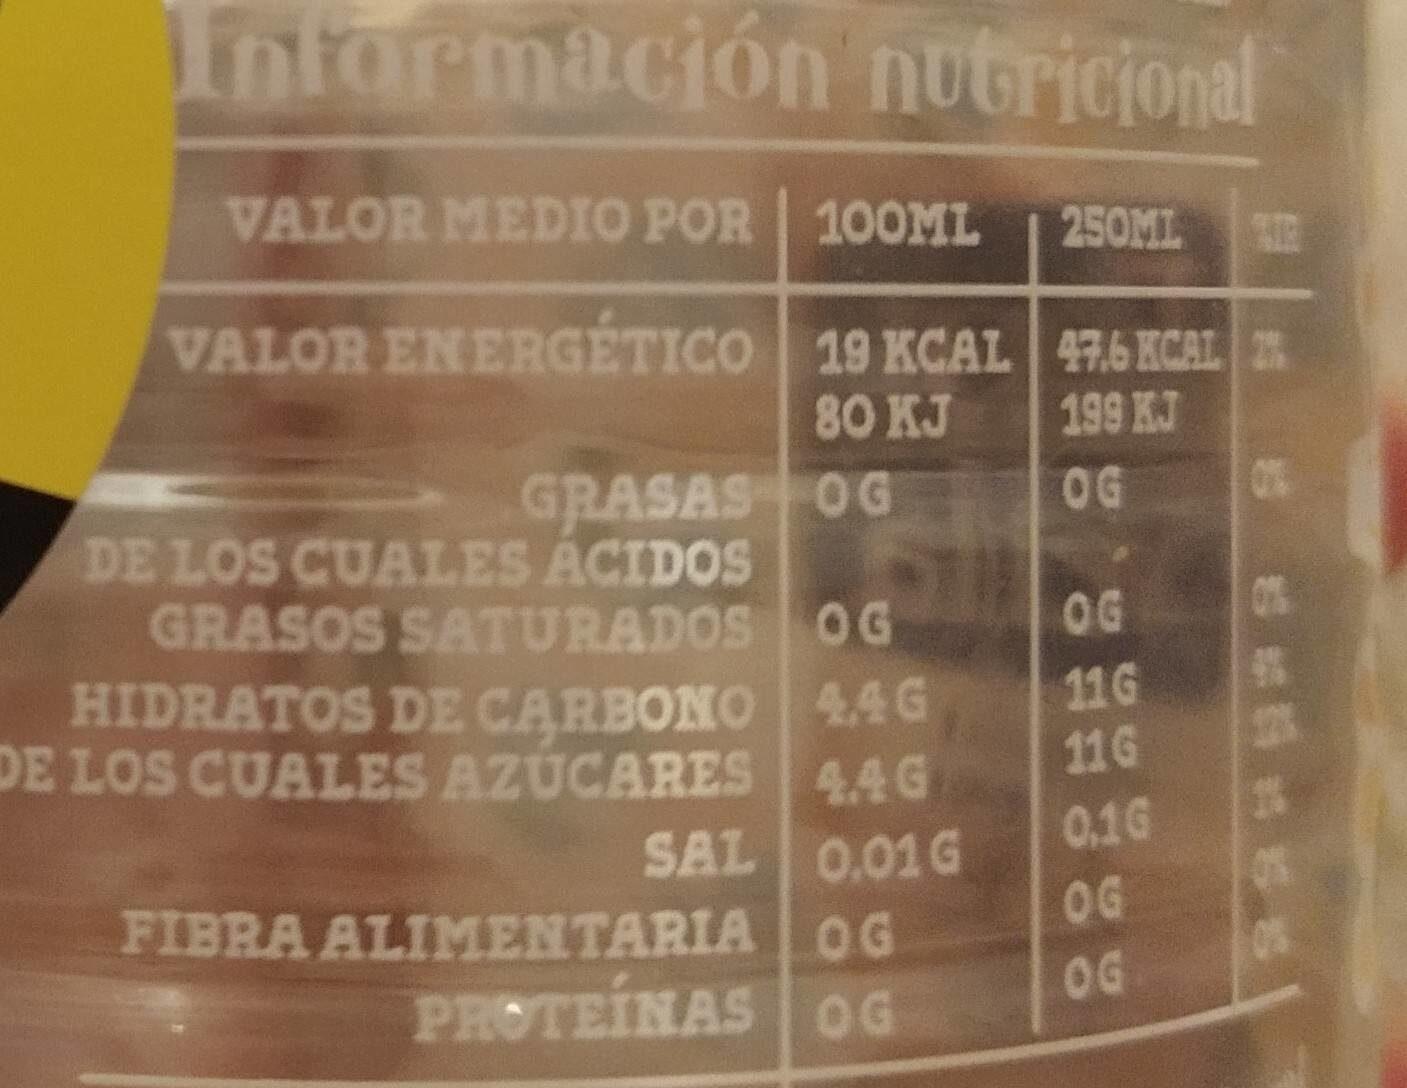 Font Vella Levité Agua Con Extractos De Té Sabor Limón - Nutrition facts - fr